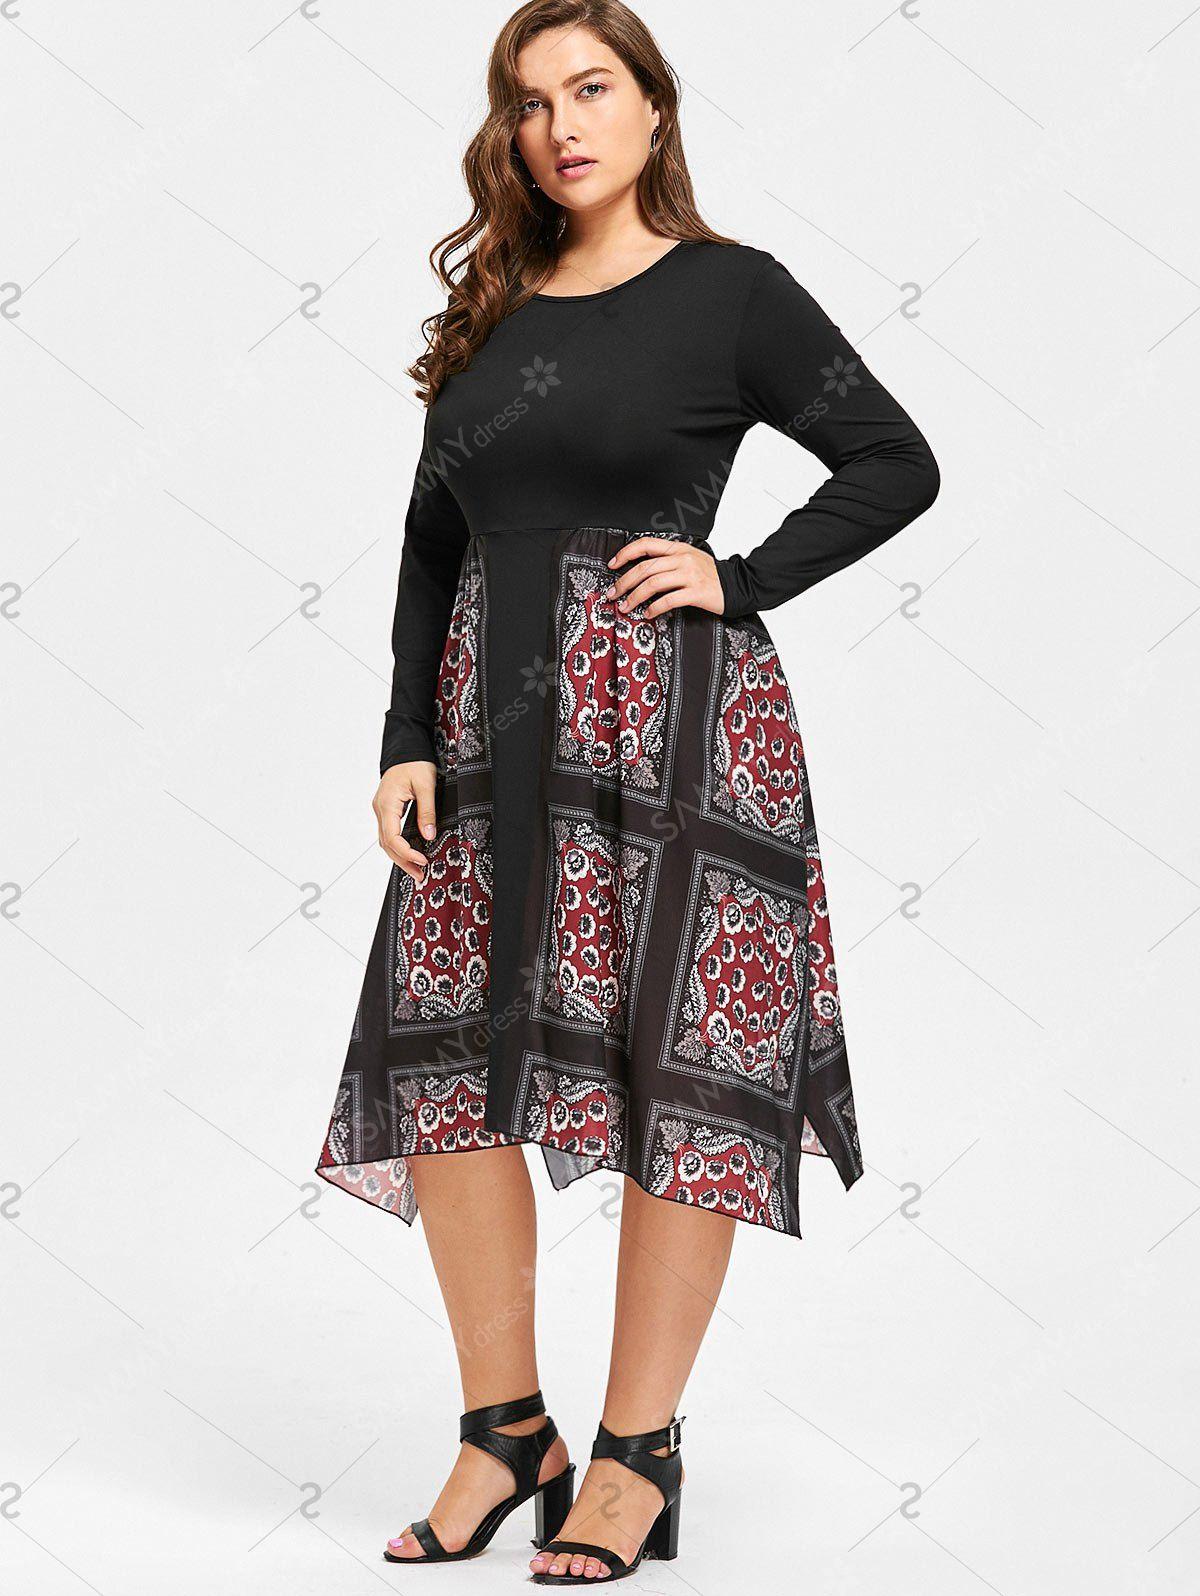 Handkerchief floral print plus size dress black xl me like